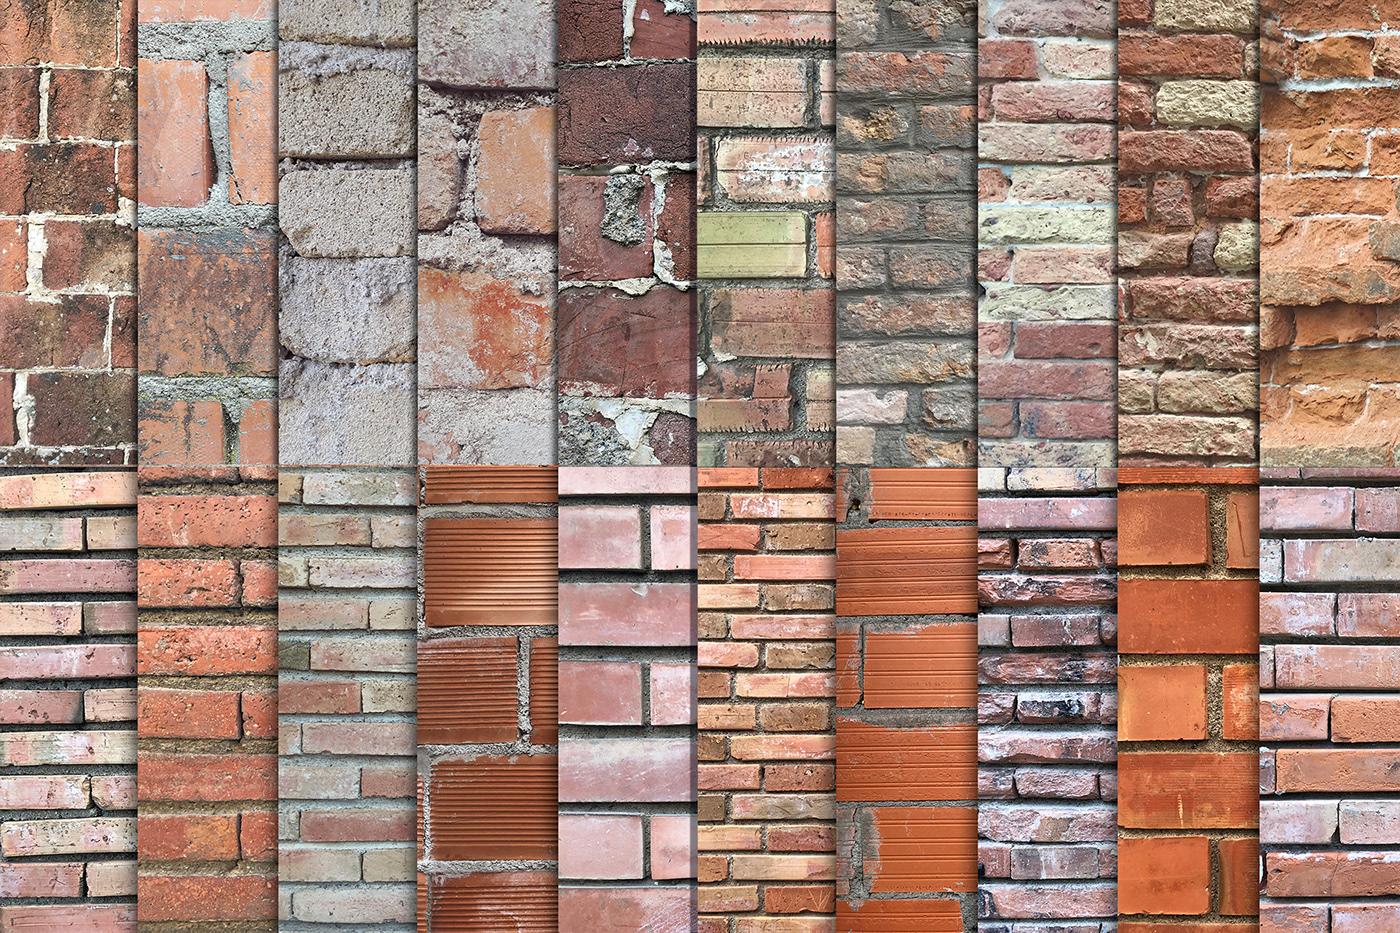 brick bundle grunge old sale Street textures wall